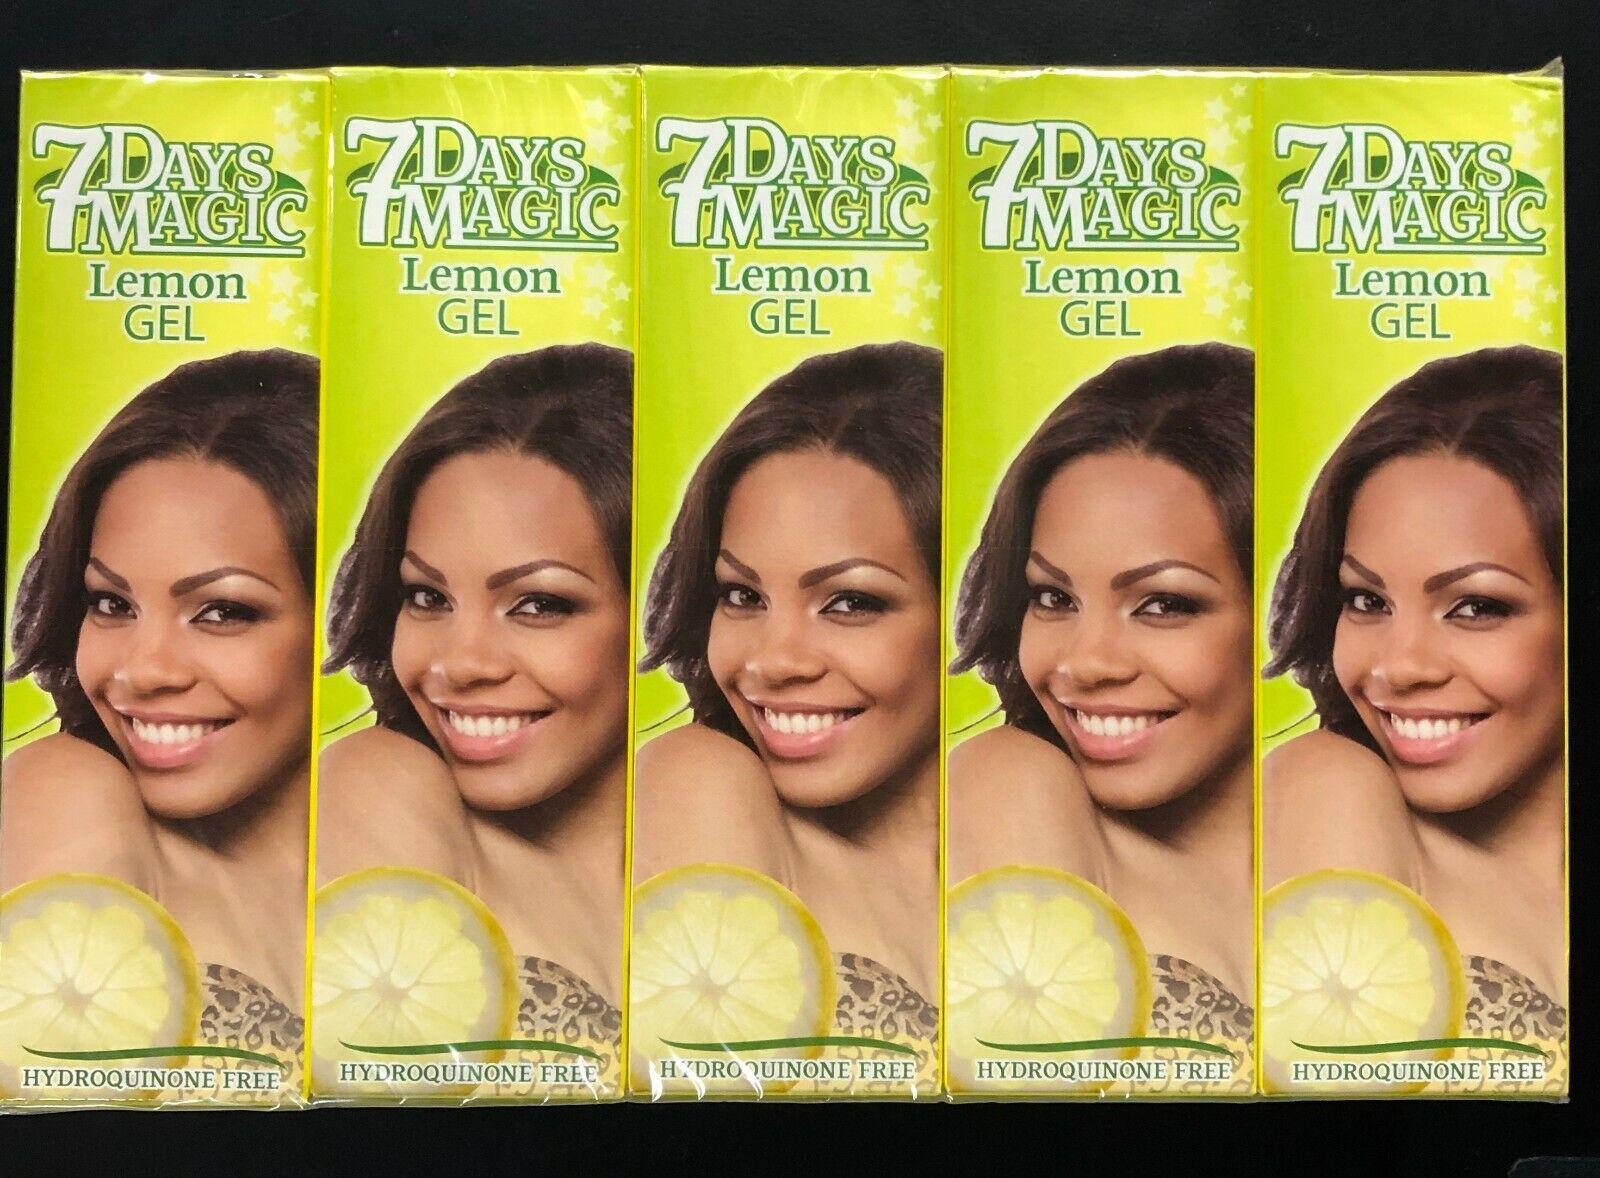 7 days magic lemon gel hydroquinone free